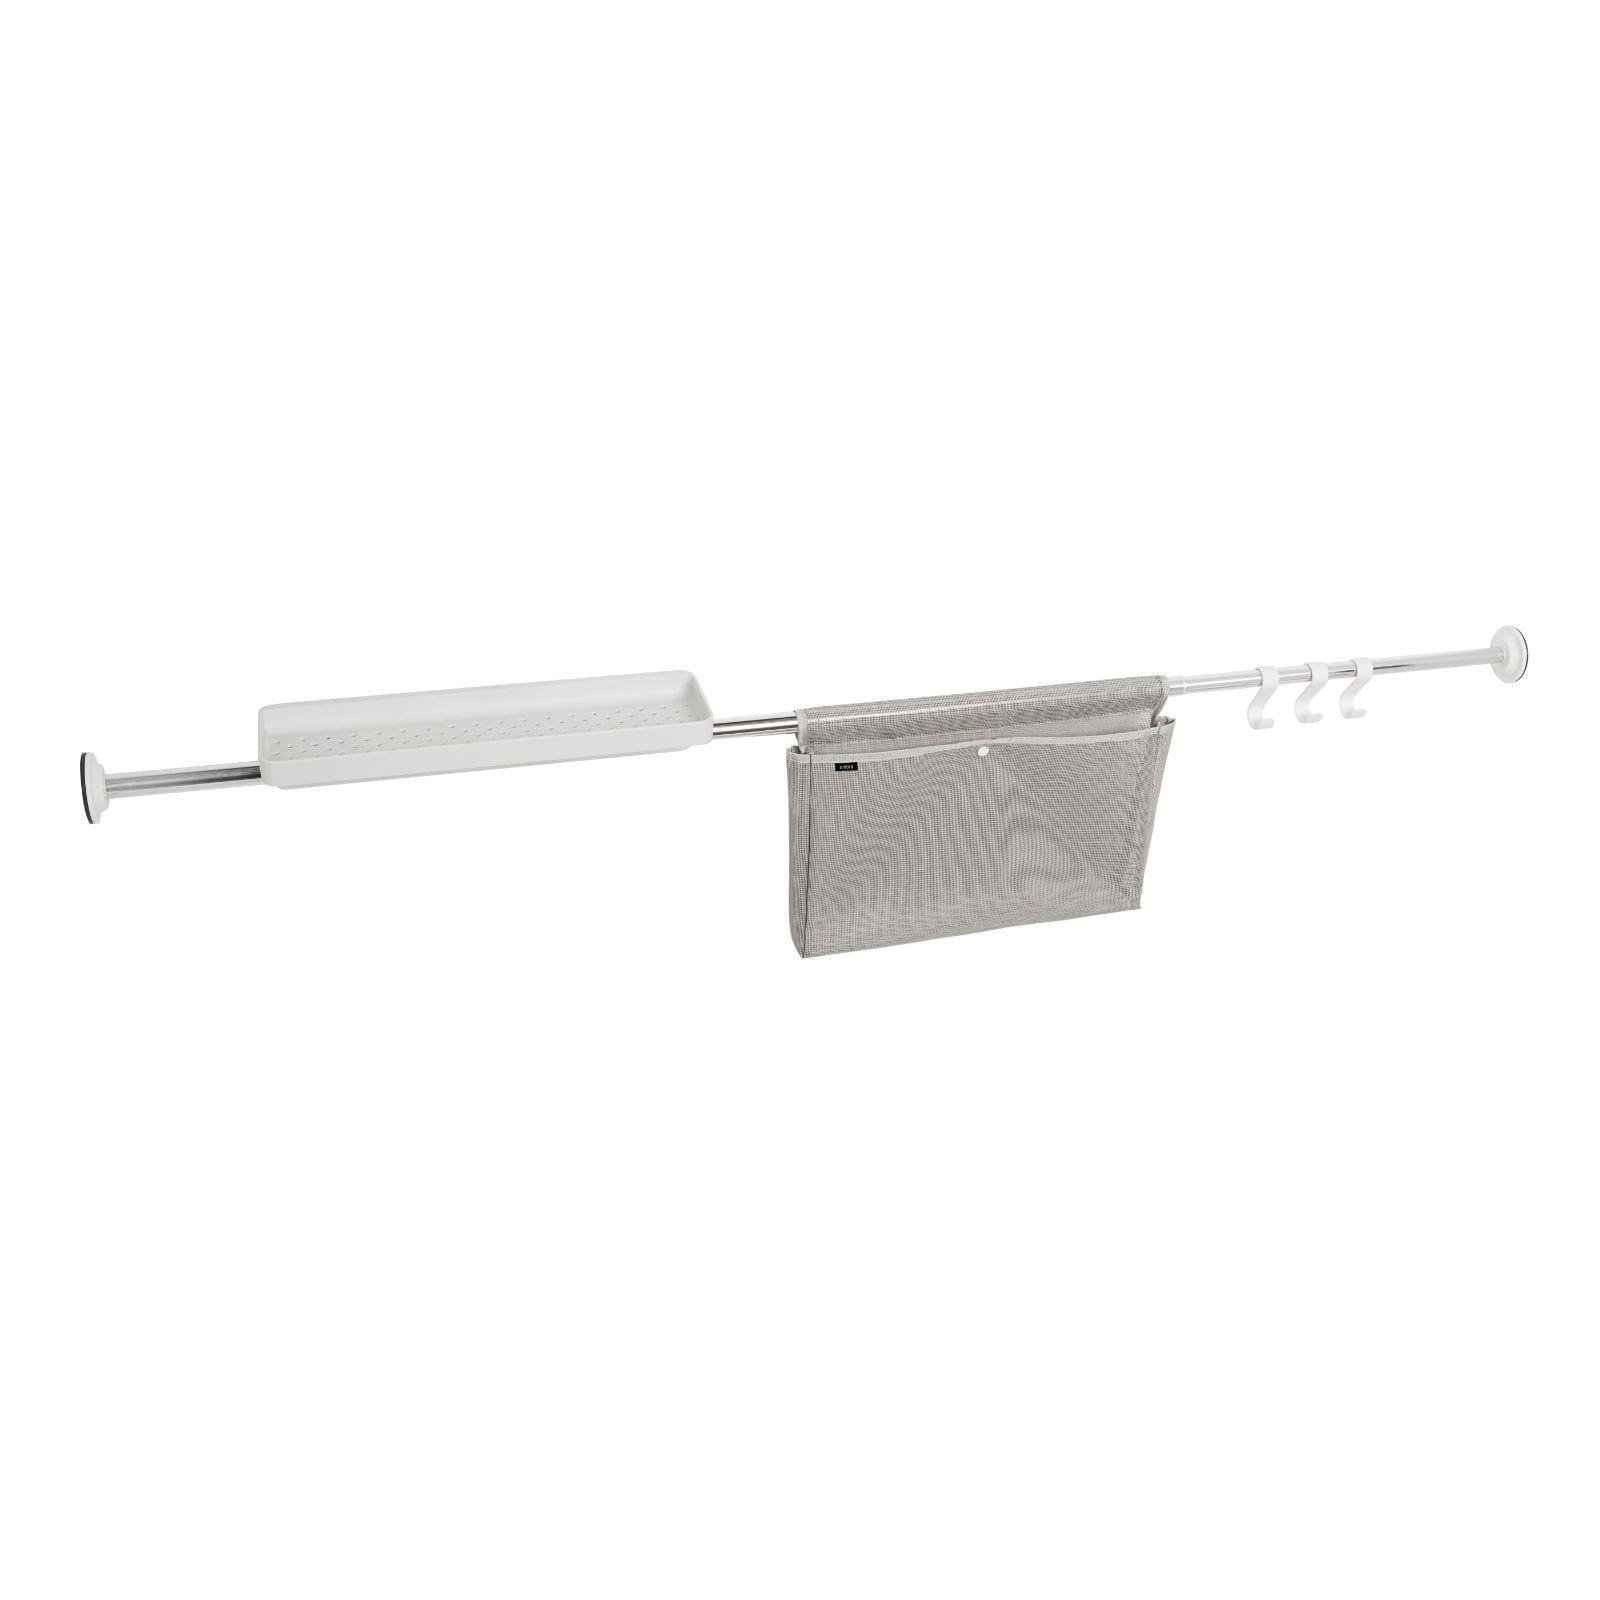 Sure-Lock Tension Storage Rod (Chrome) - Umbra